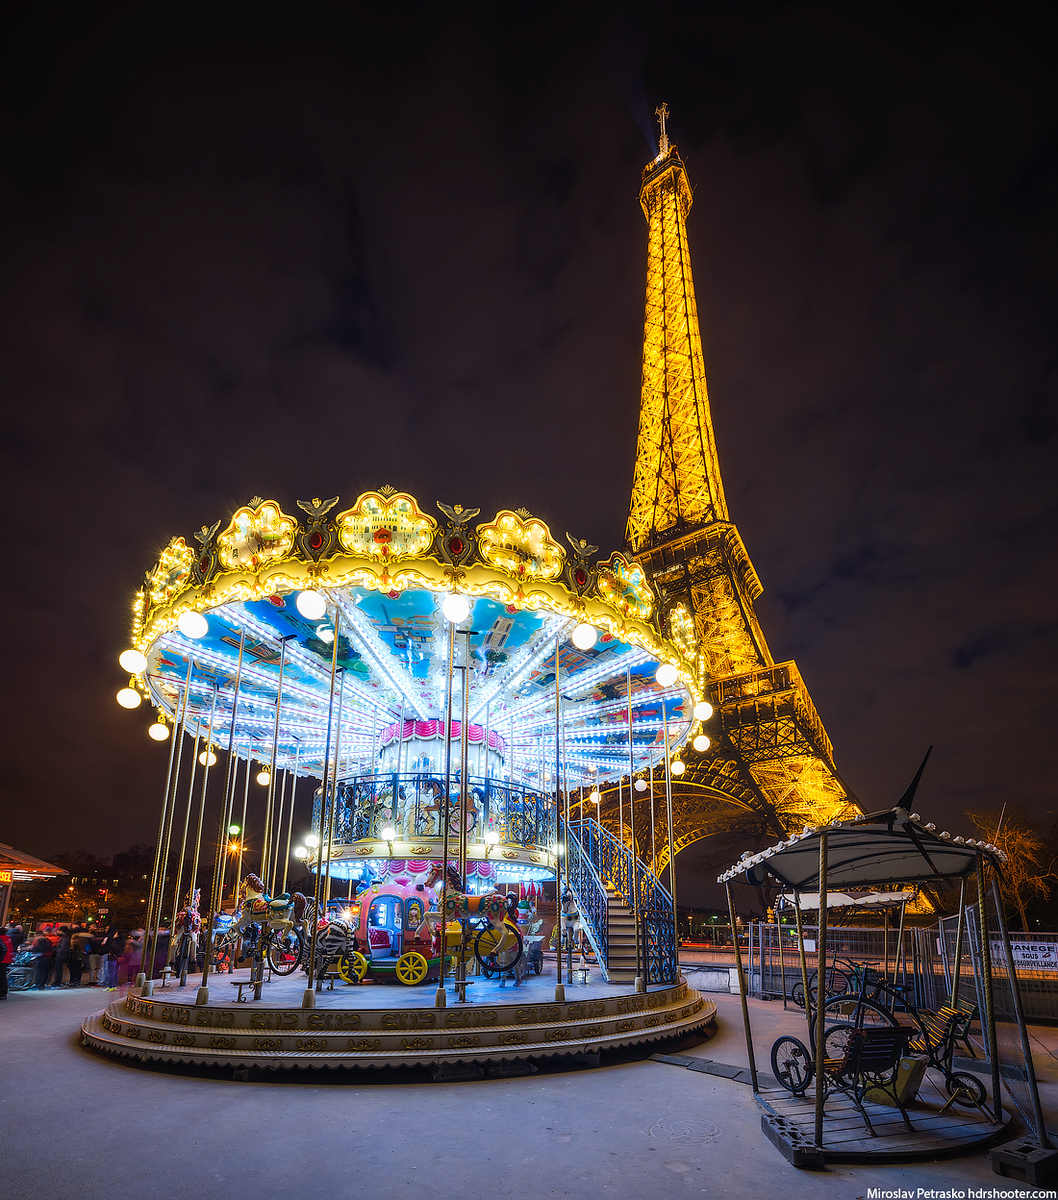 Carousel under the Eiffel tower, Paris, France